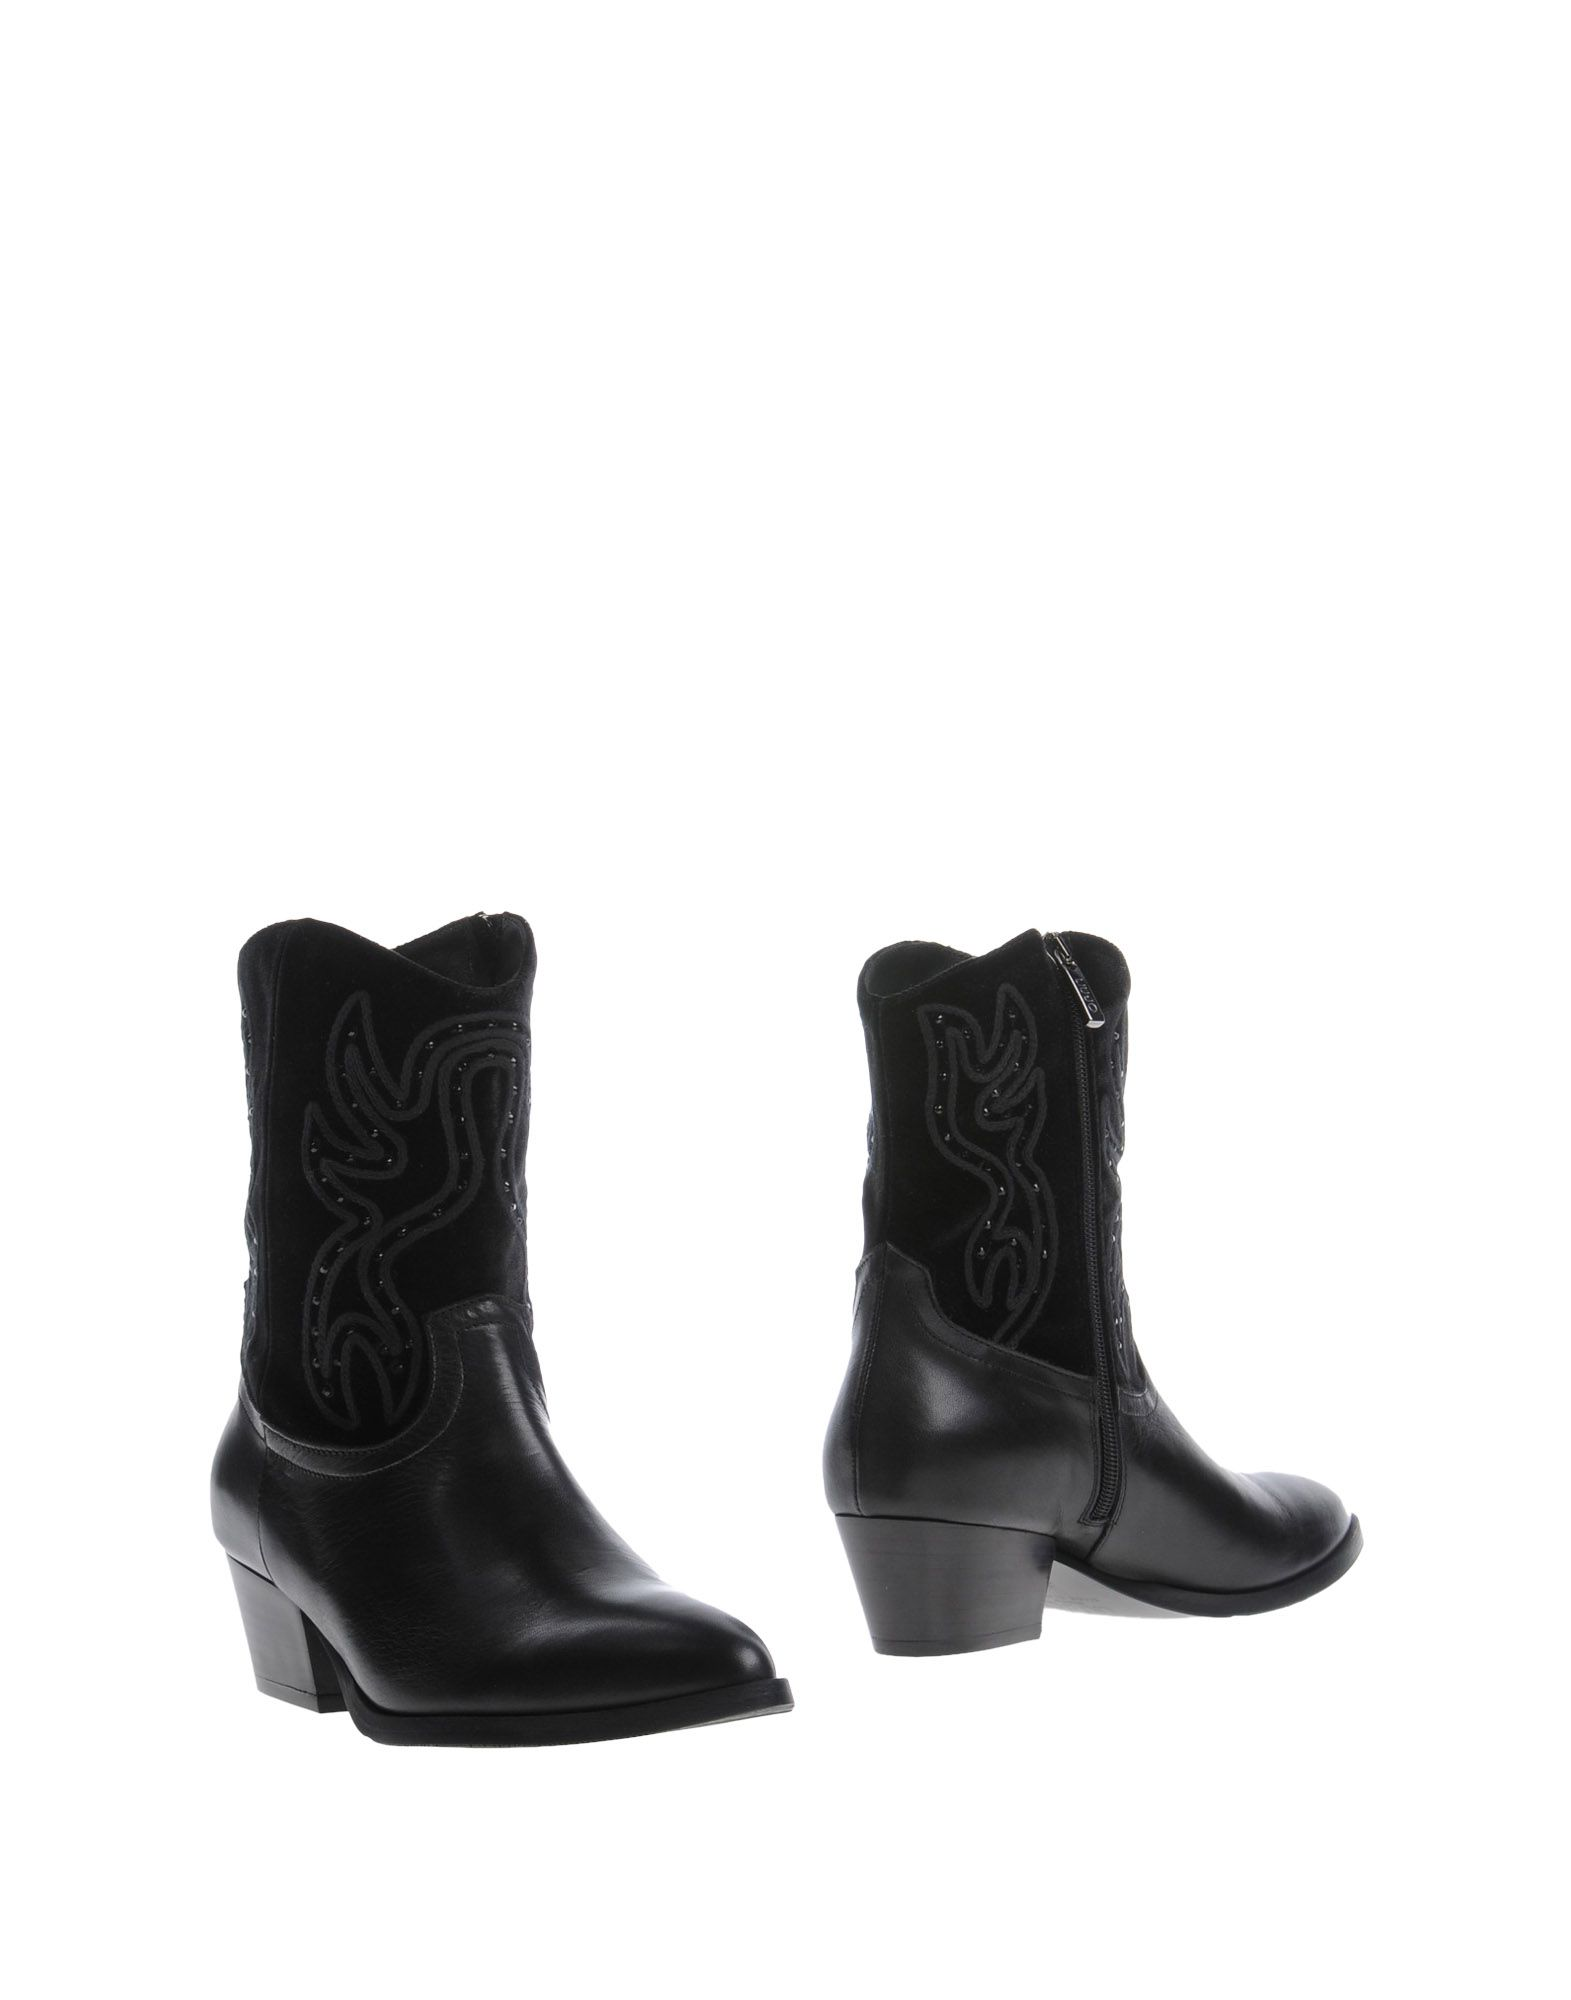 Liu •Jo Shoes Stiefelette Damen Neue  11314886MC Neue Damen Schuhe fea0ef